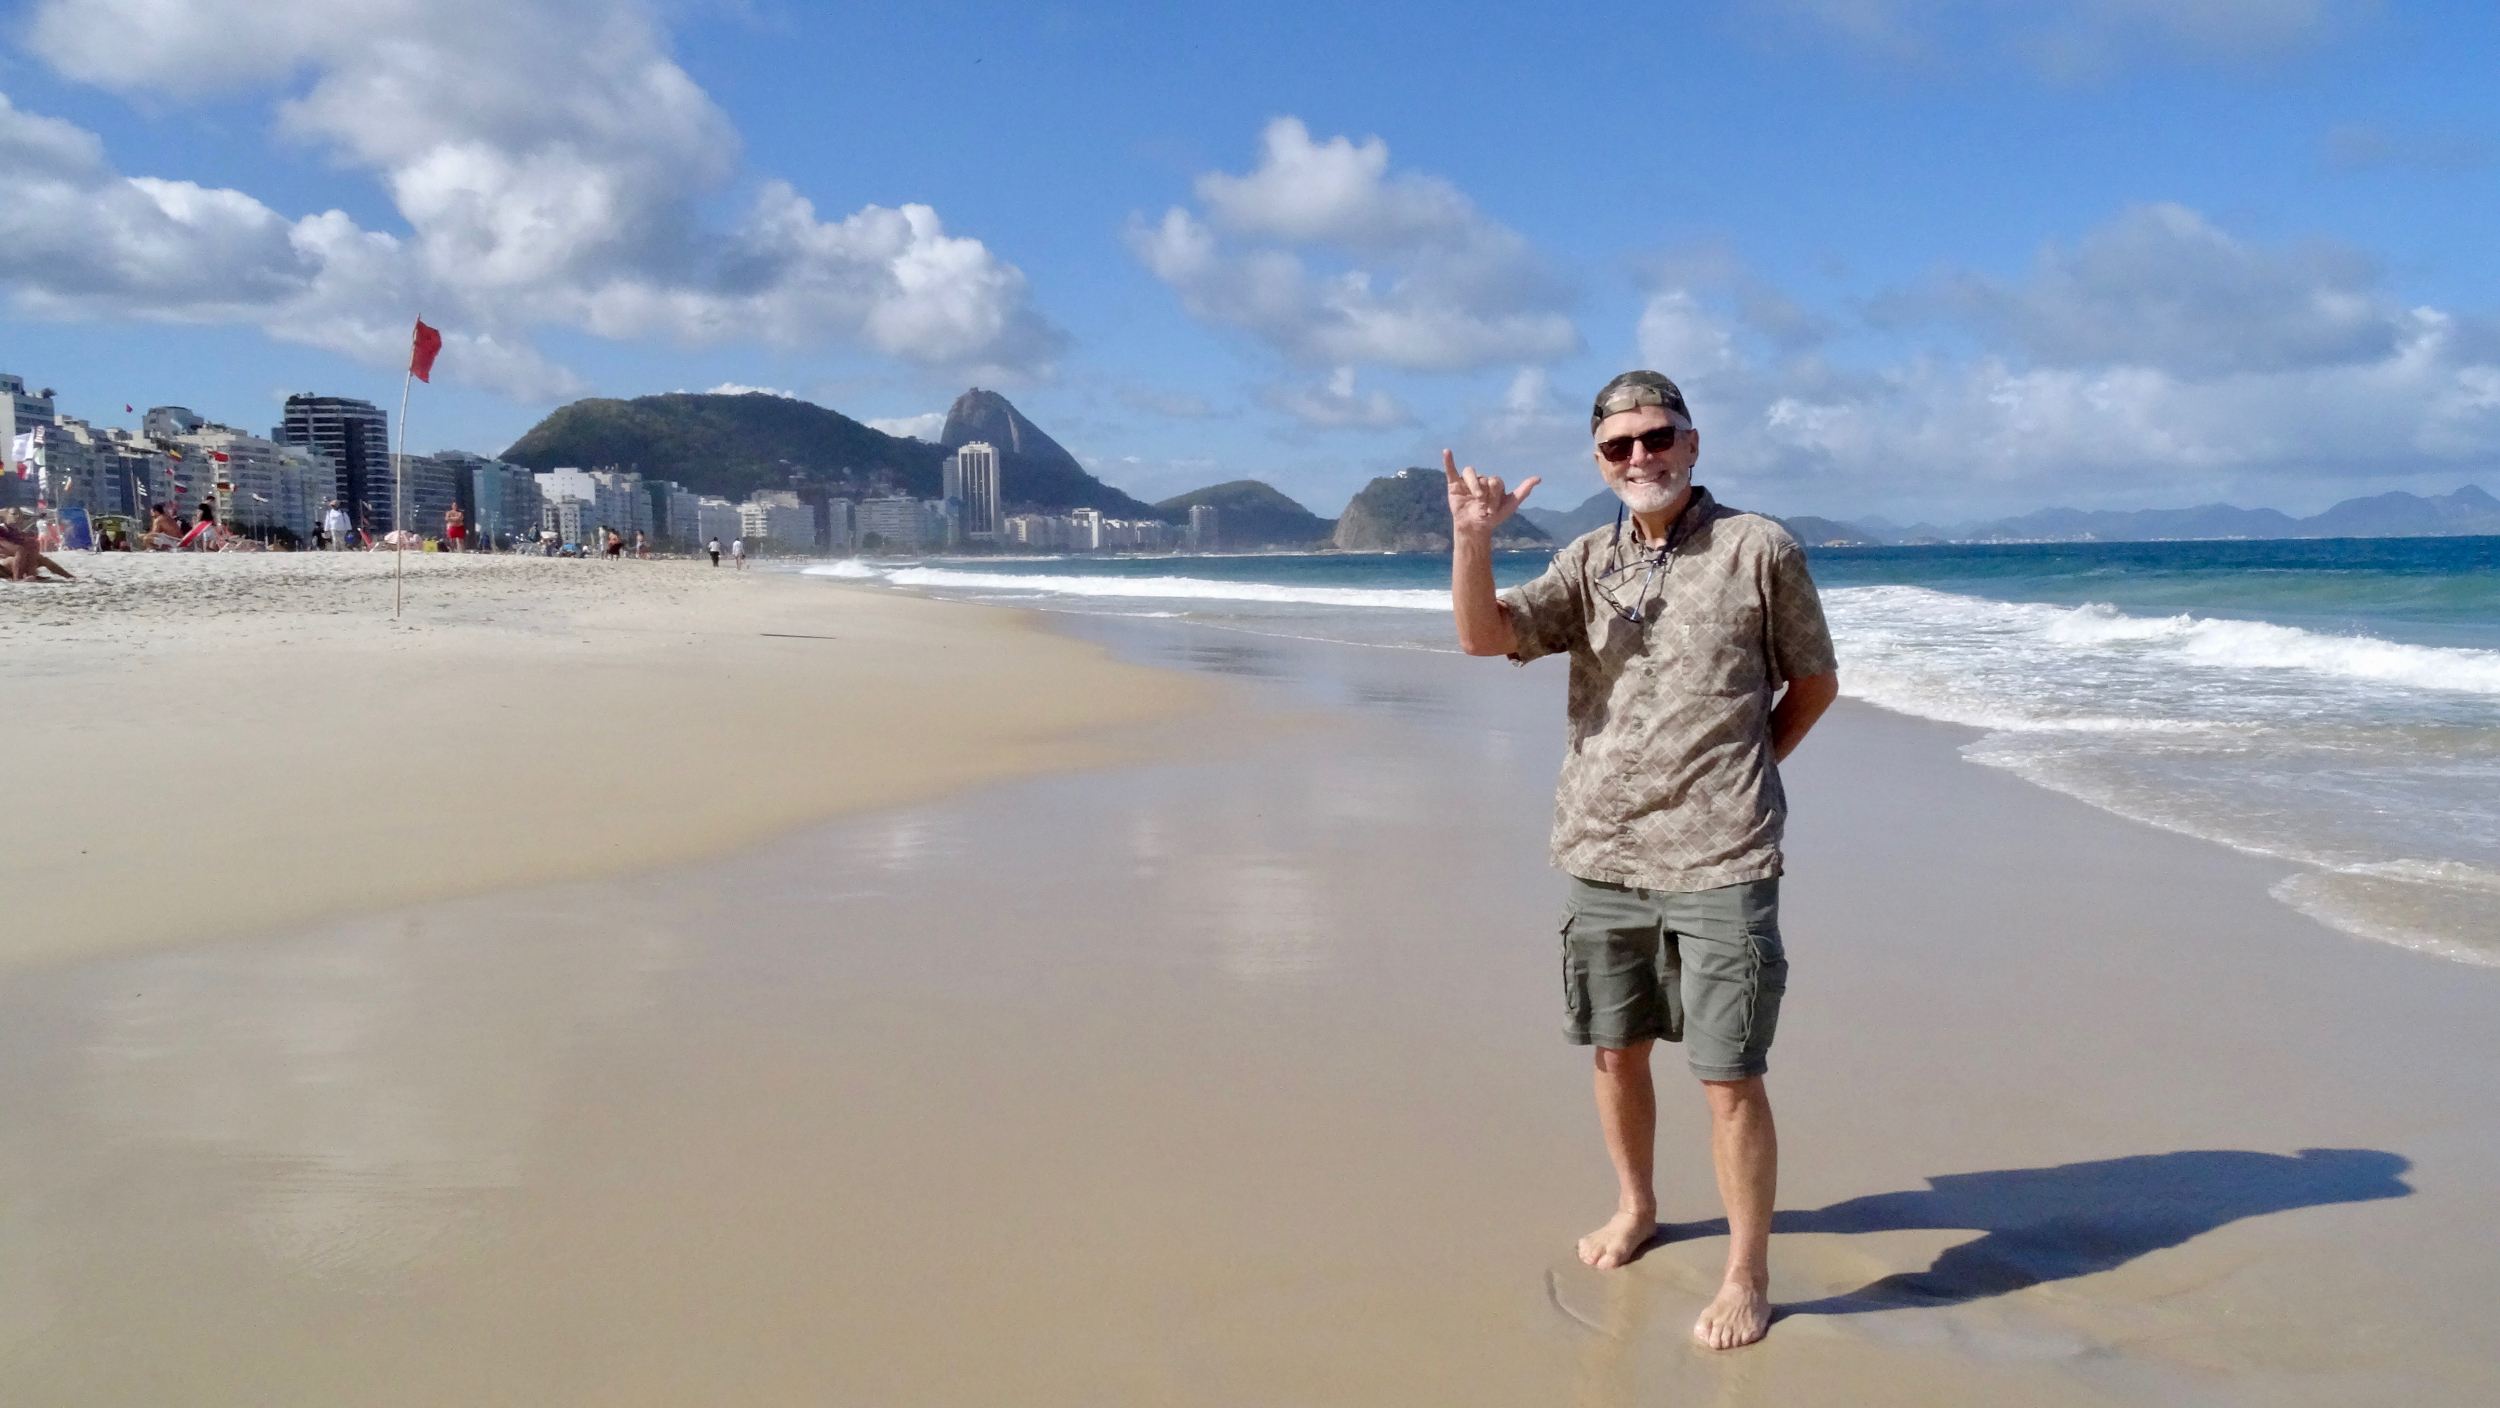 10. Bruce on Copacabana